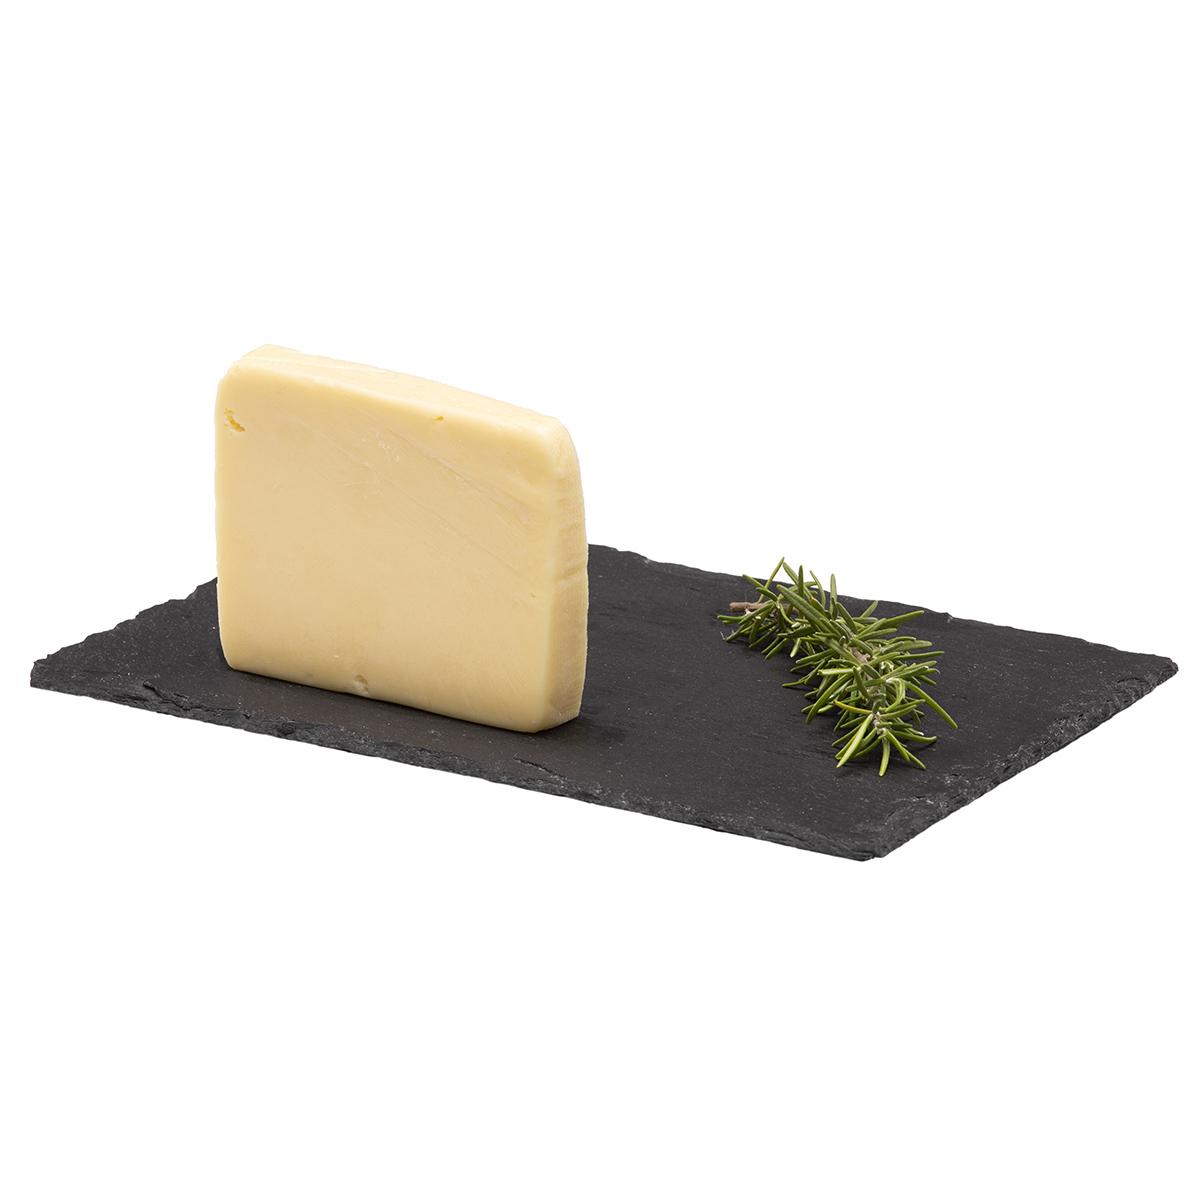 Edamer formaggio vendita online